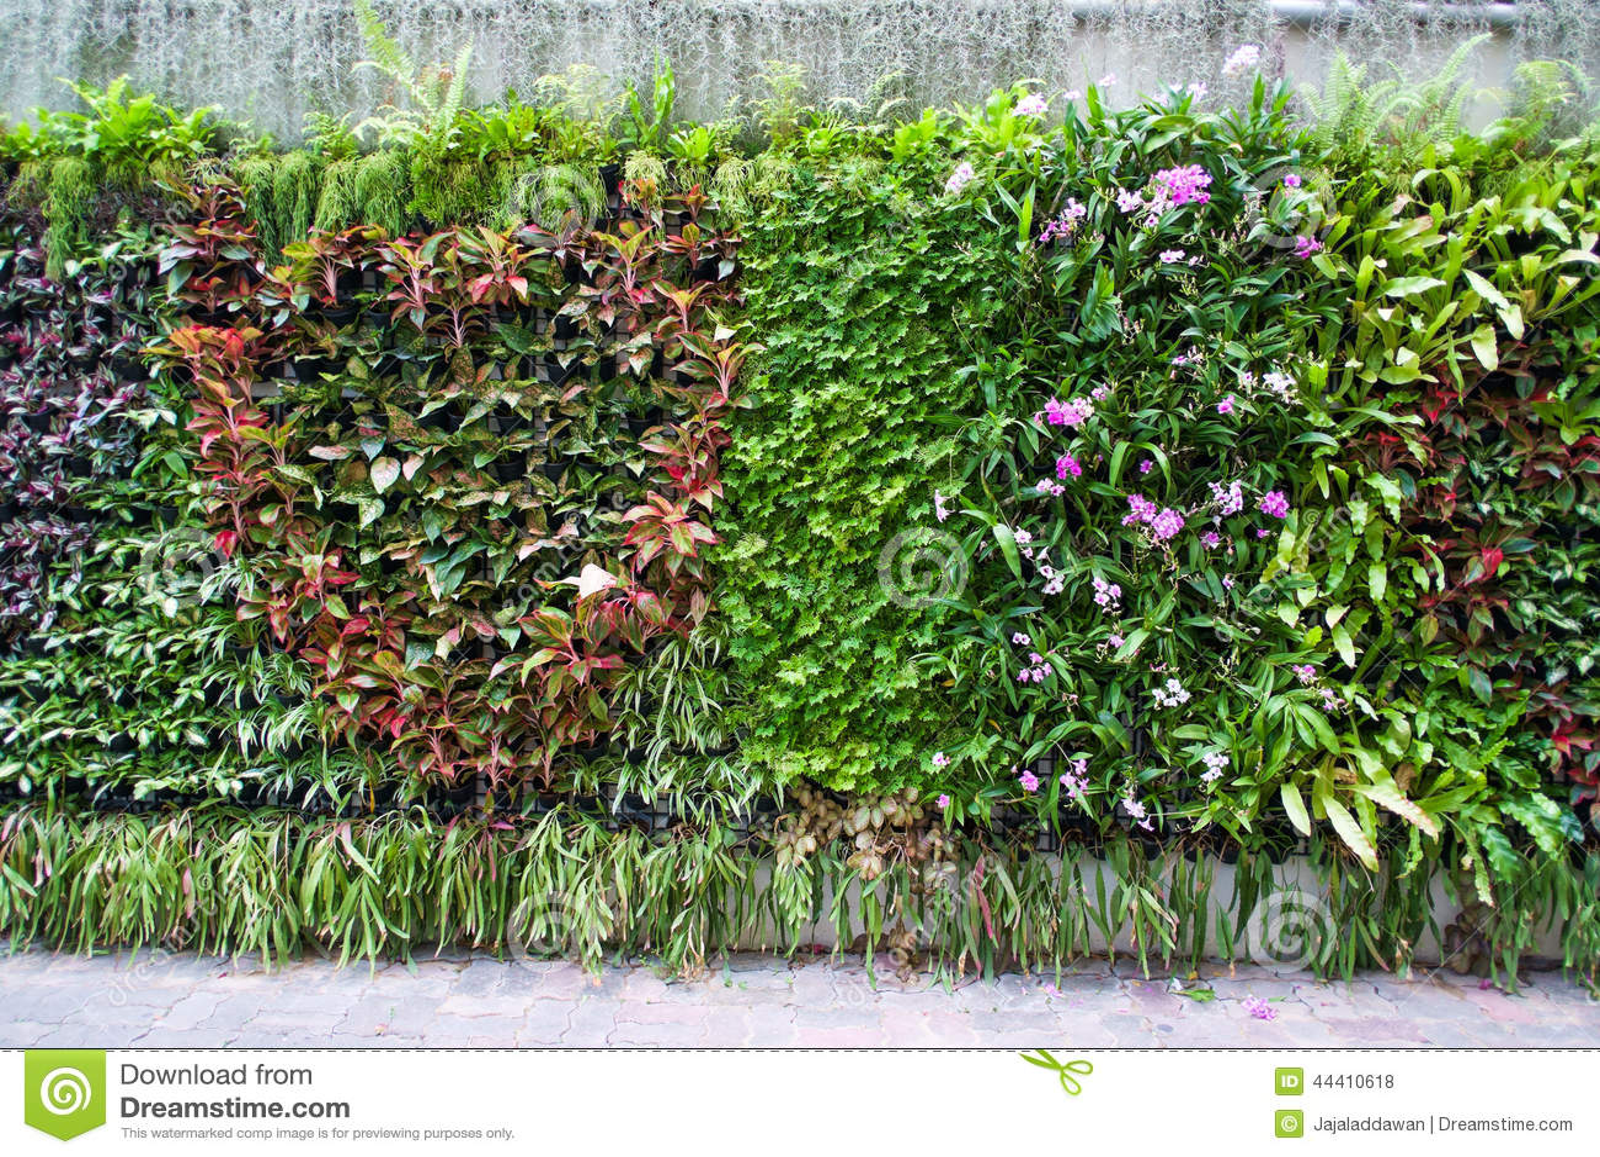 plantas jardim tropical:Tropical Garden Plants and Flowers